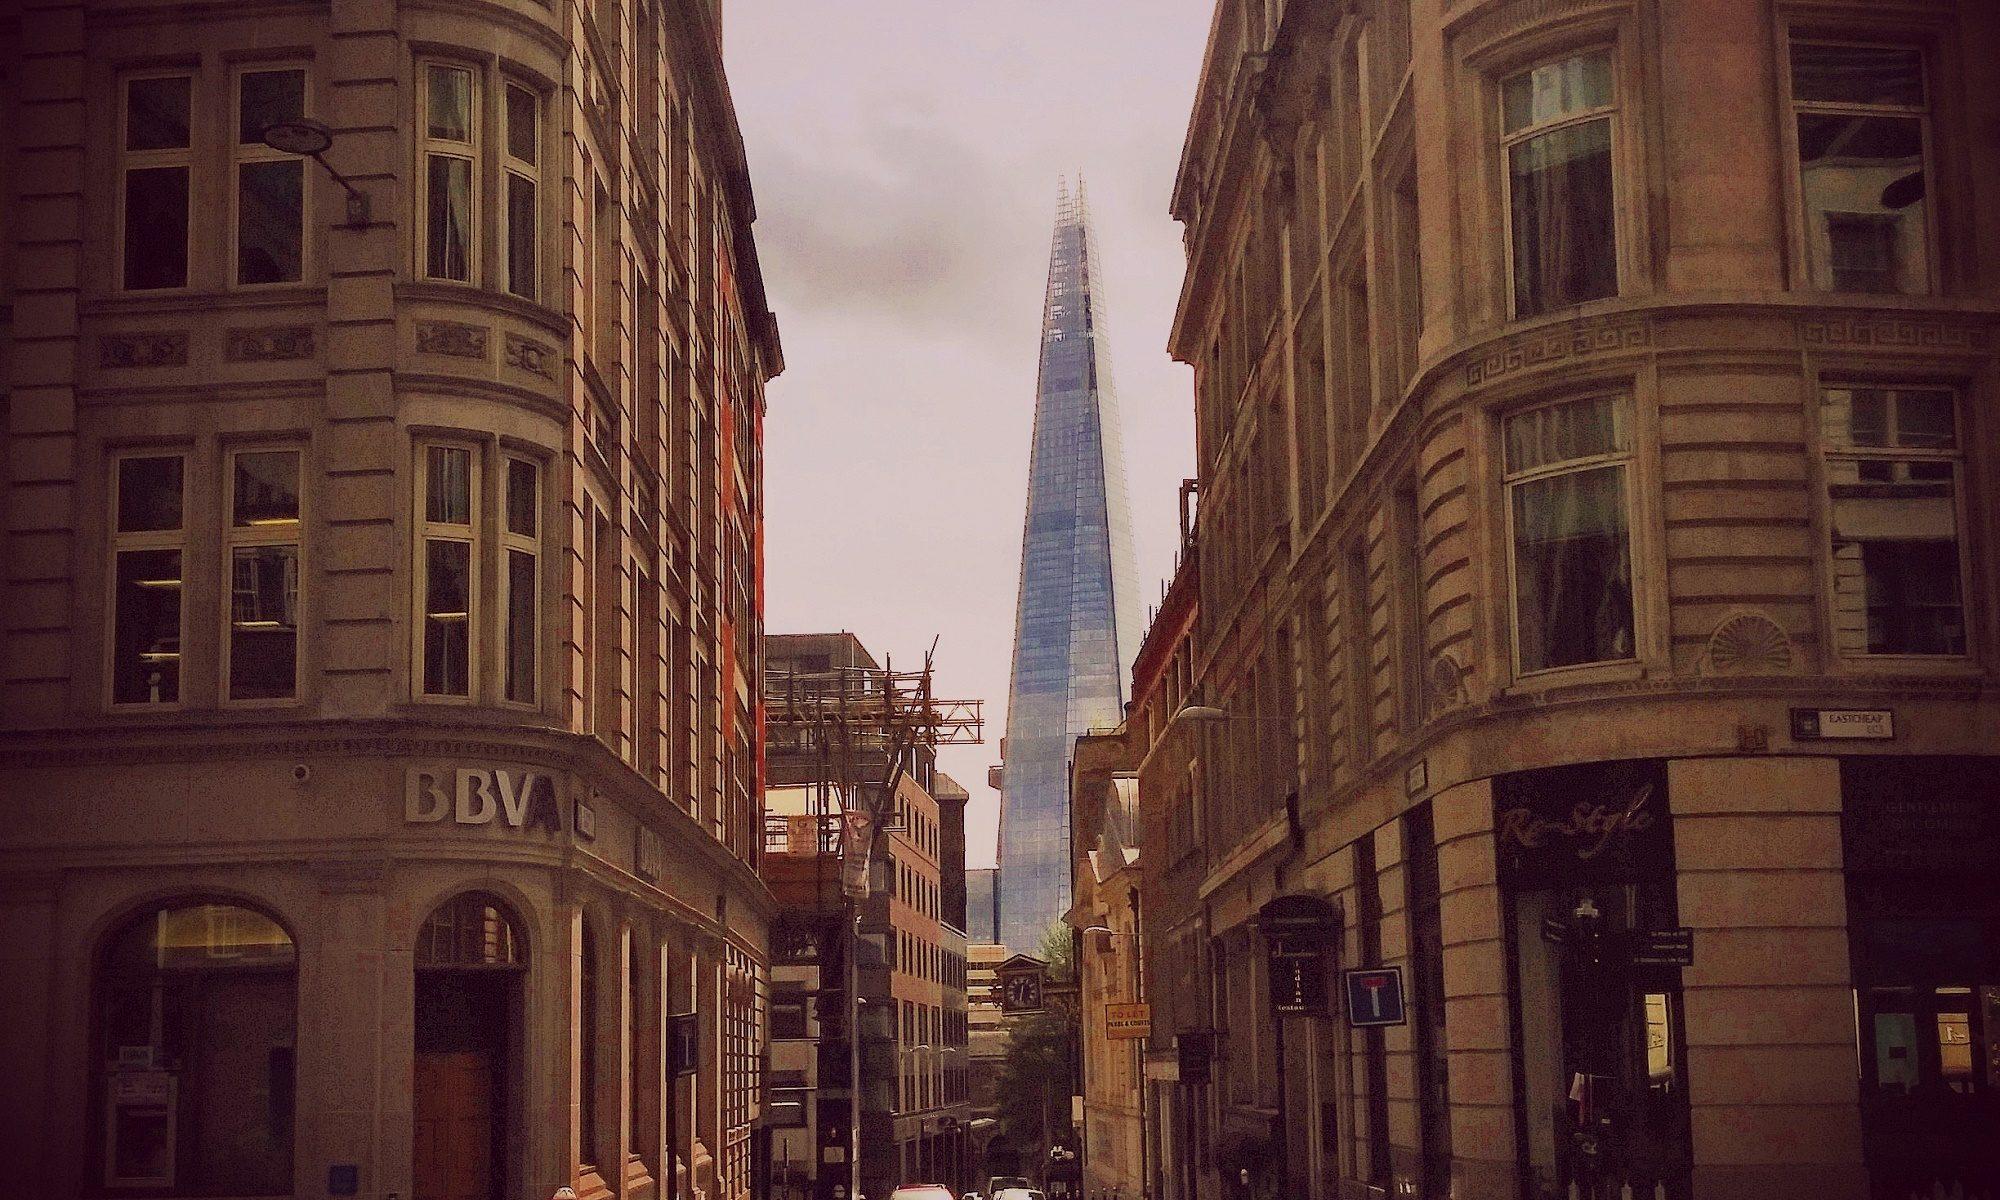 London Street - Shard in Distance